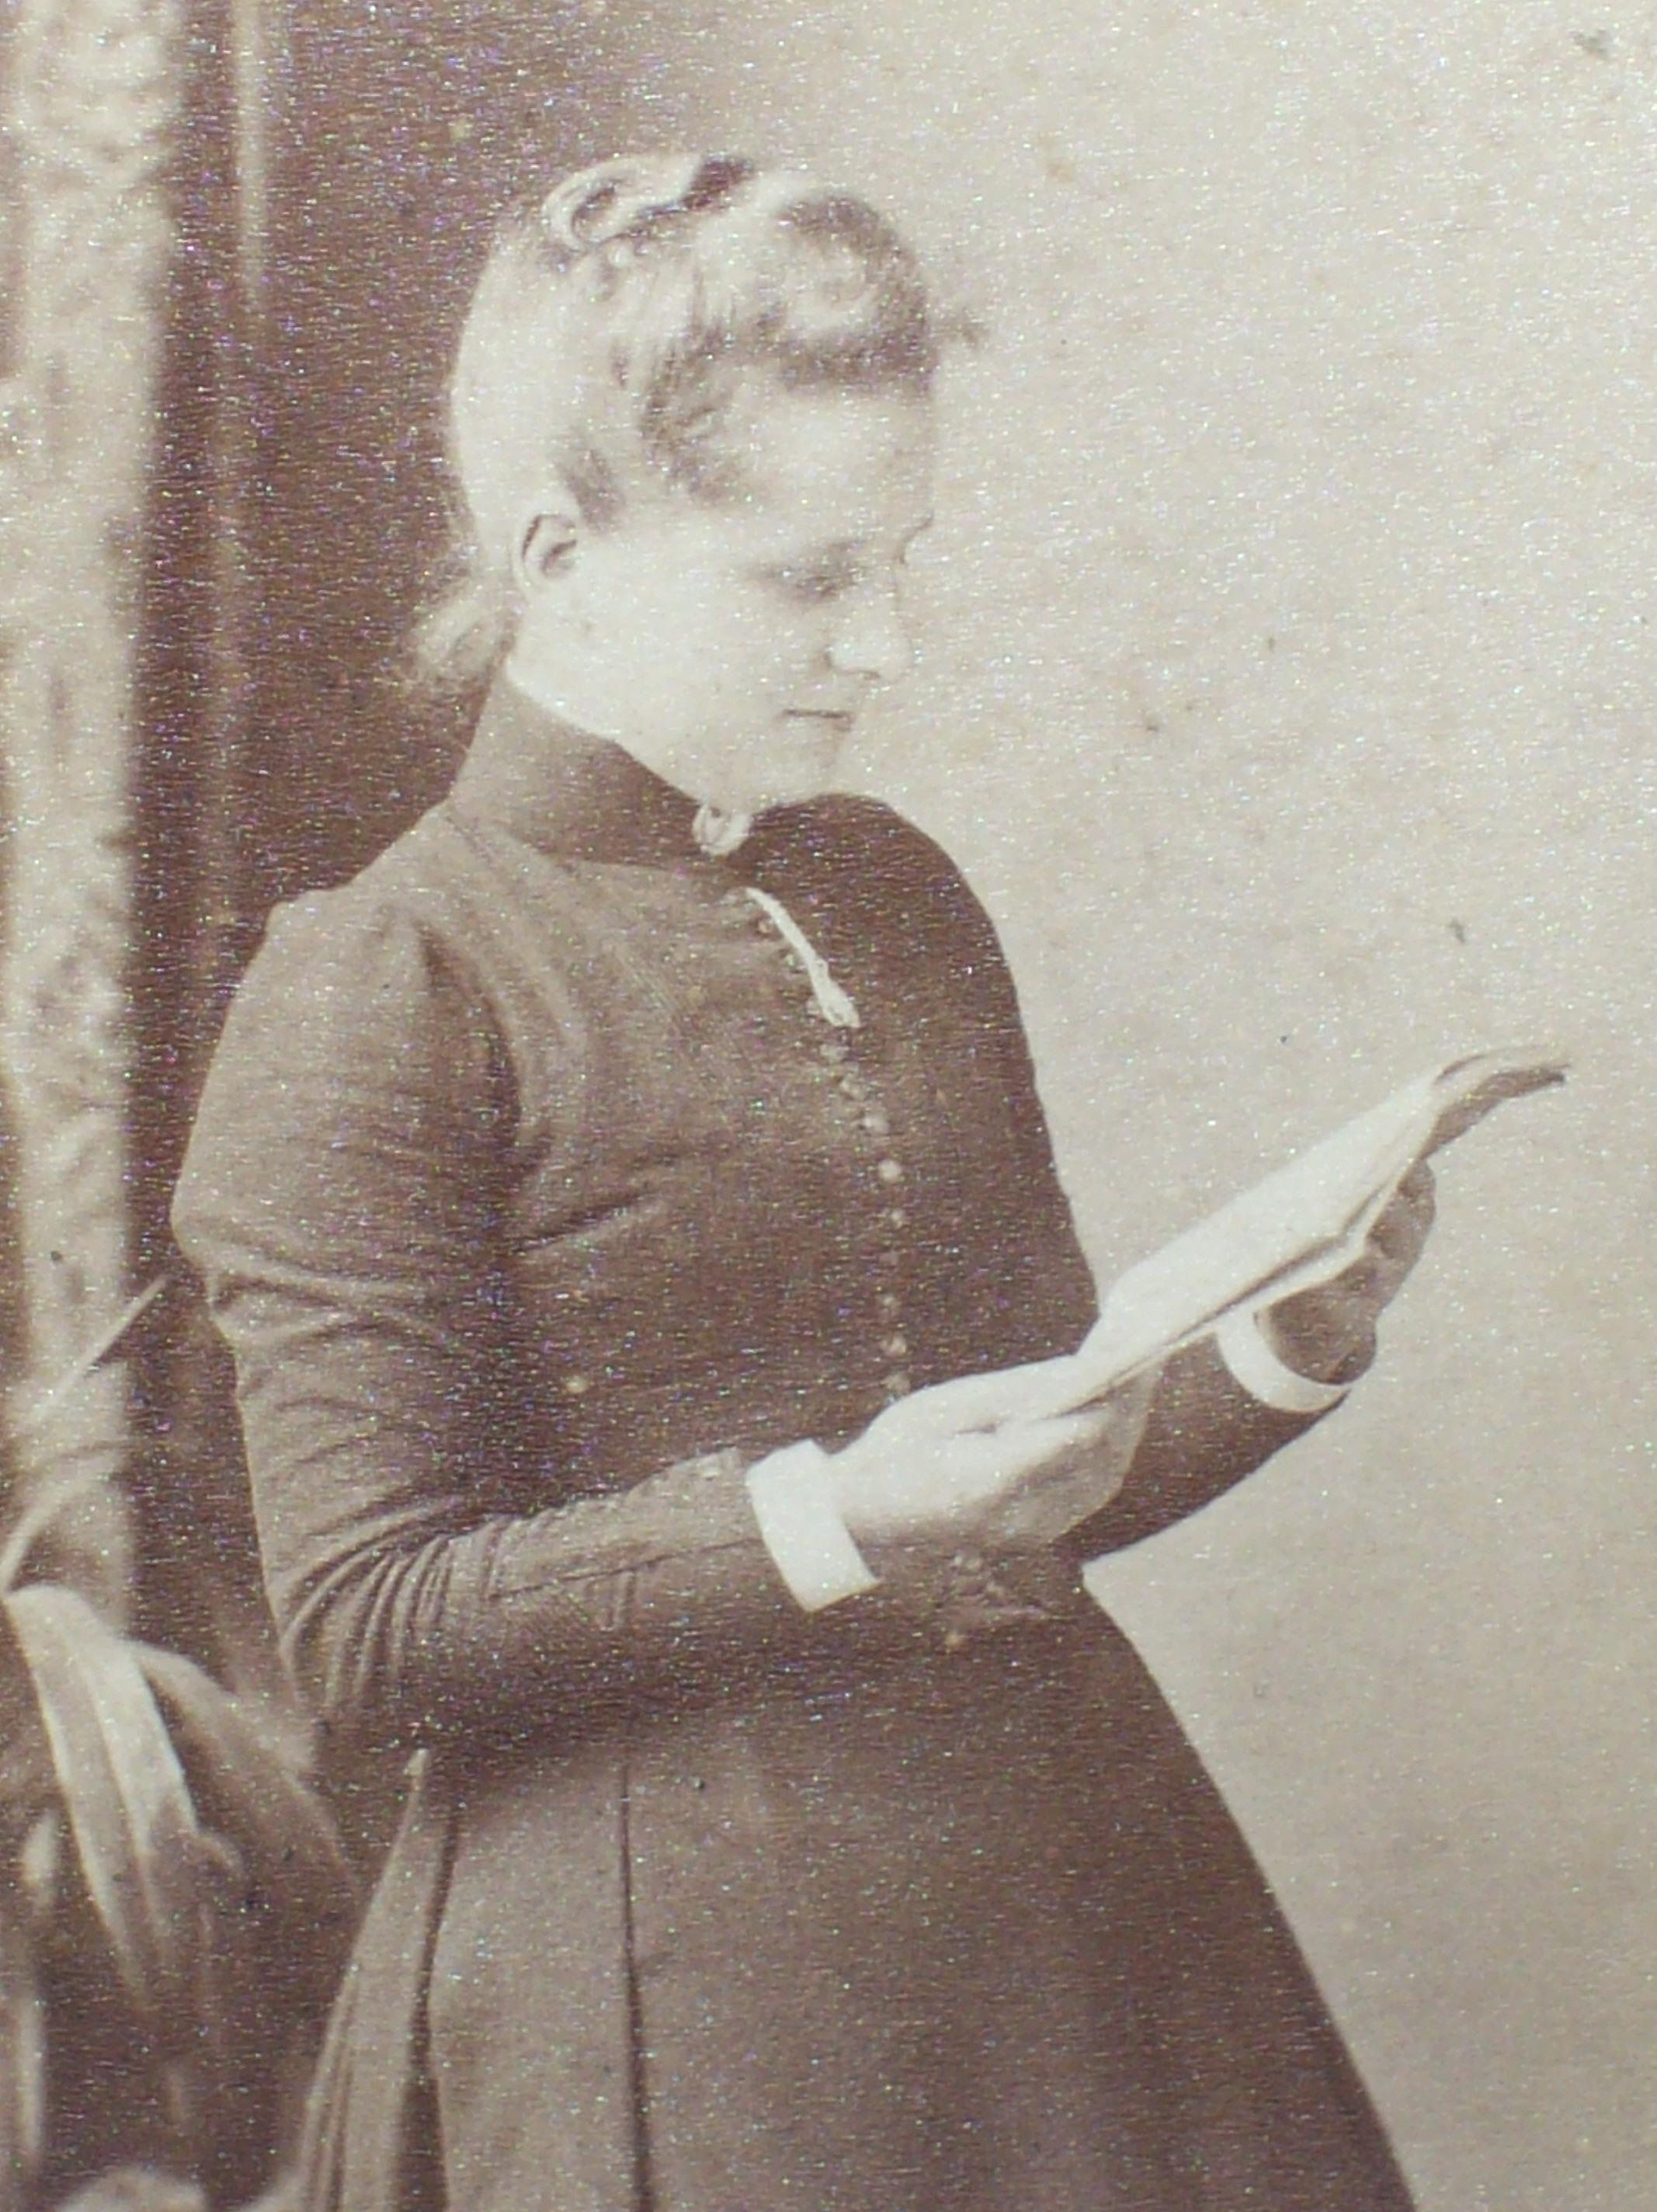 Mary Maria (Ria) Attfield